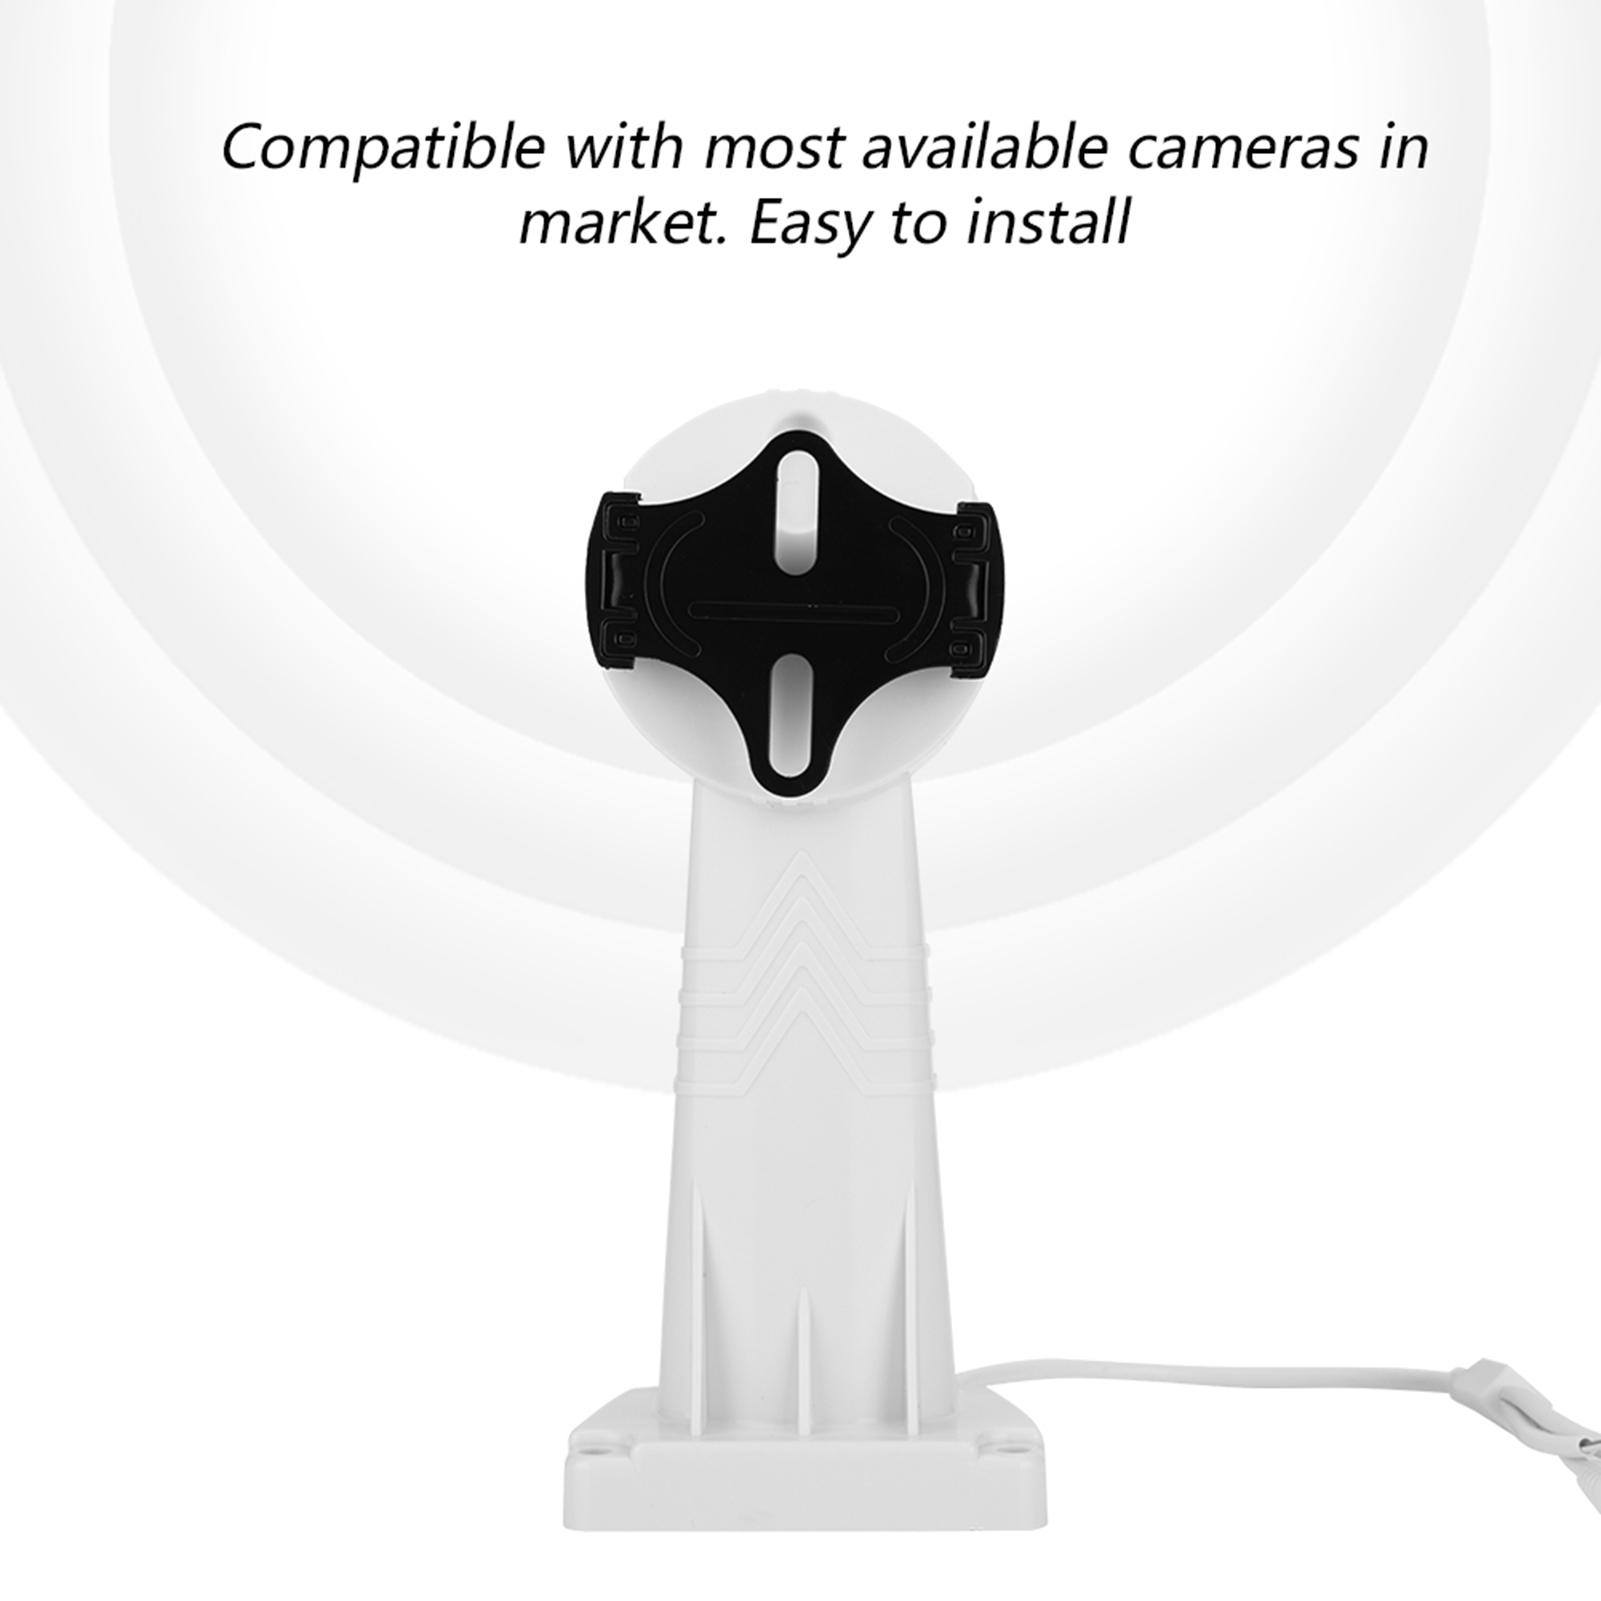 CCTV-Cameras-Rotate-Pan-Tilt-PTZ-Bracket-Electrical-Mount-Stand-Support-RS485-ZZ miniature 12